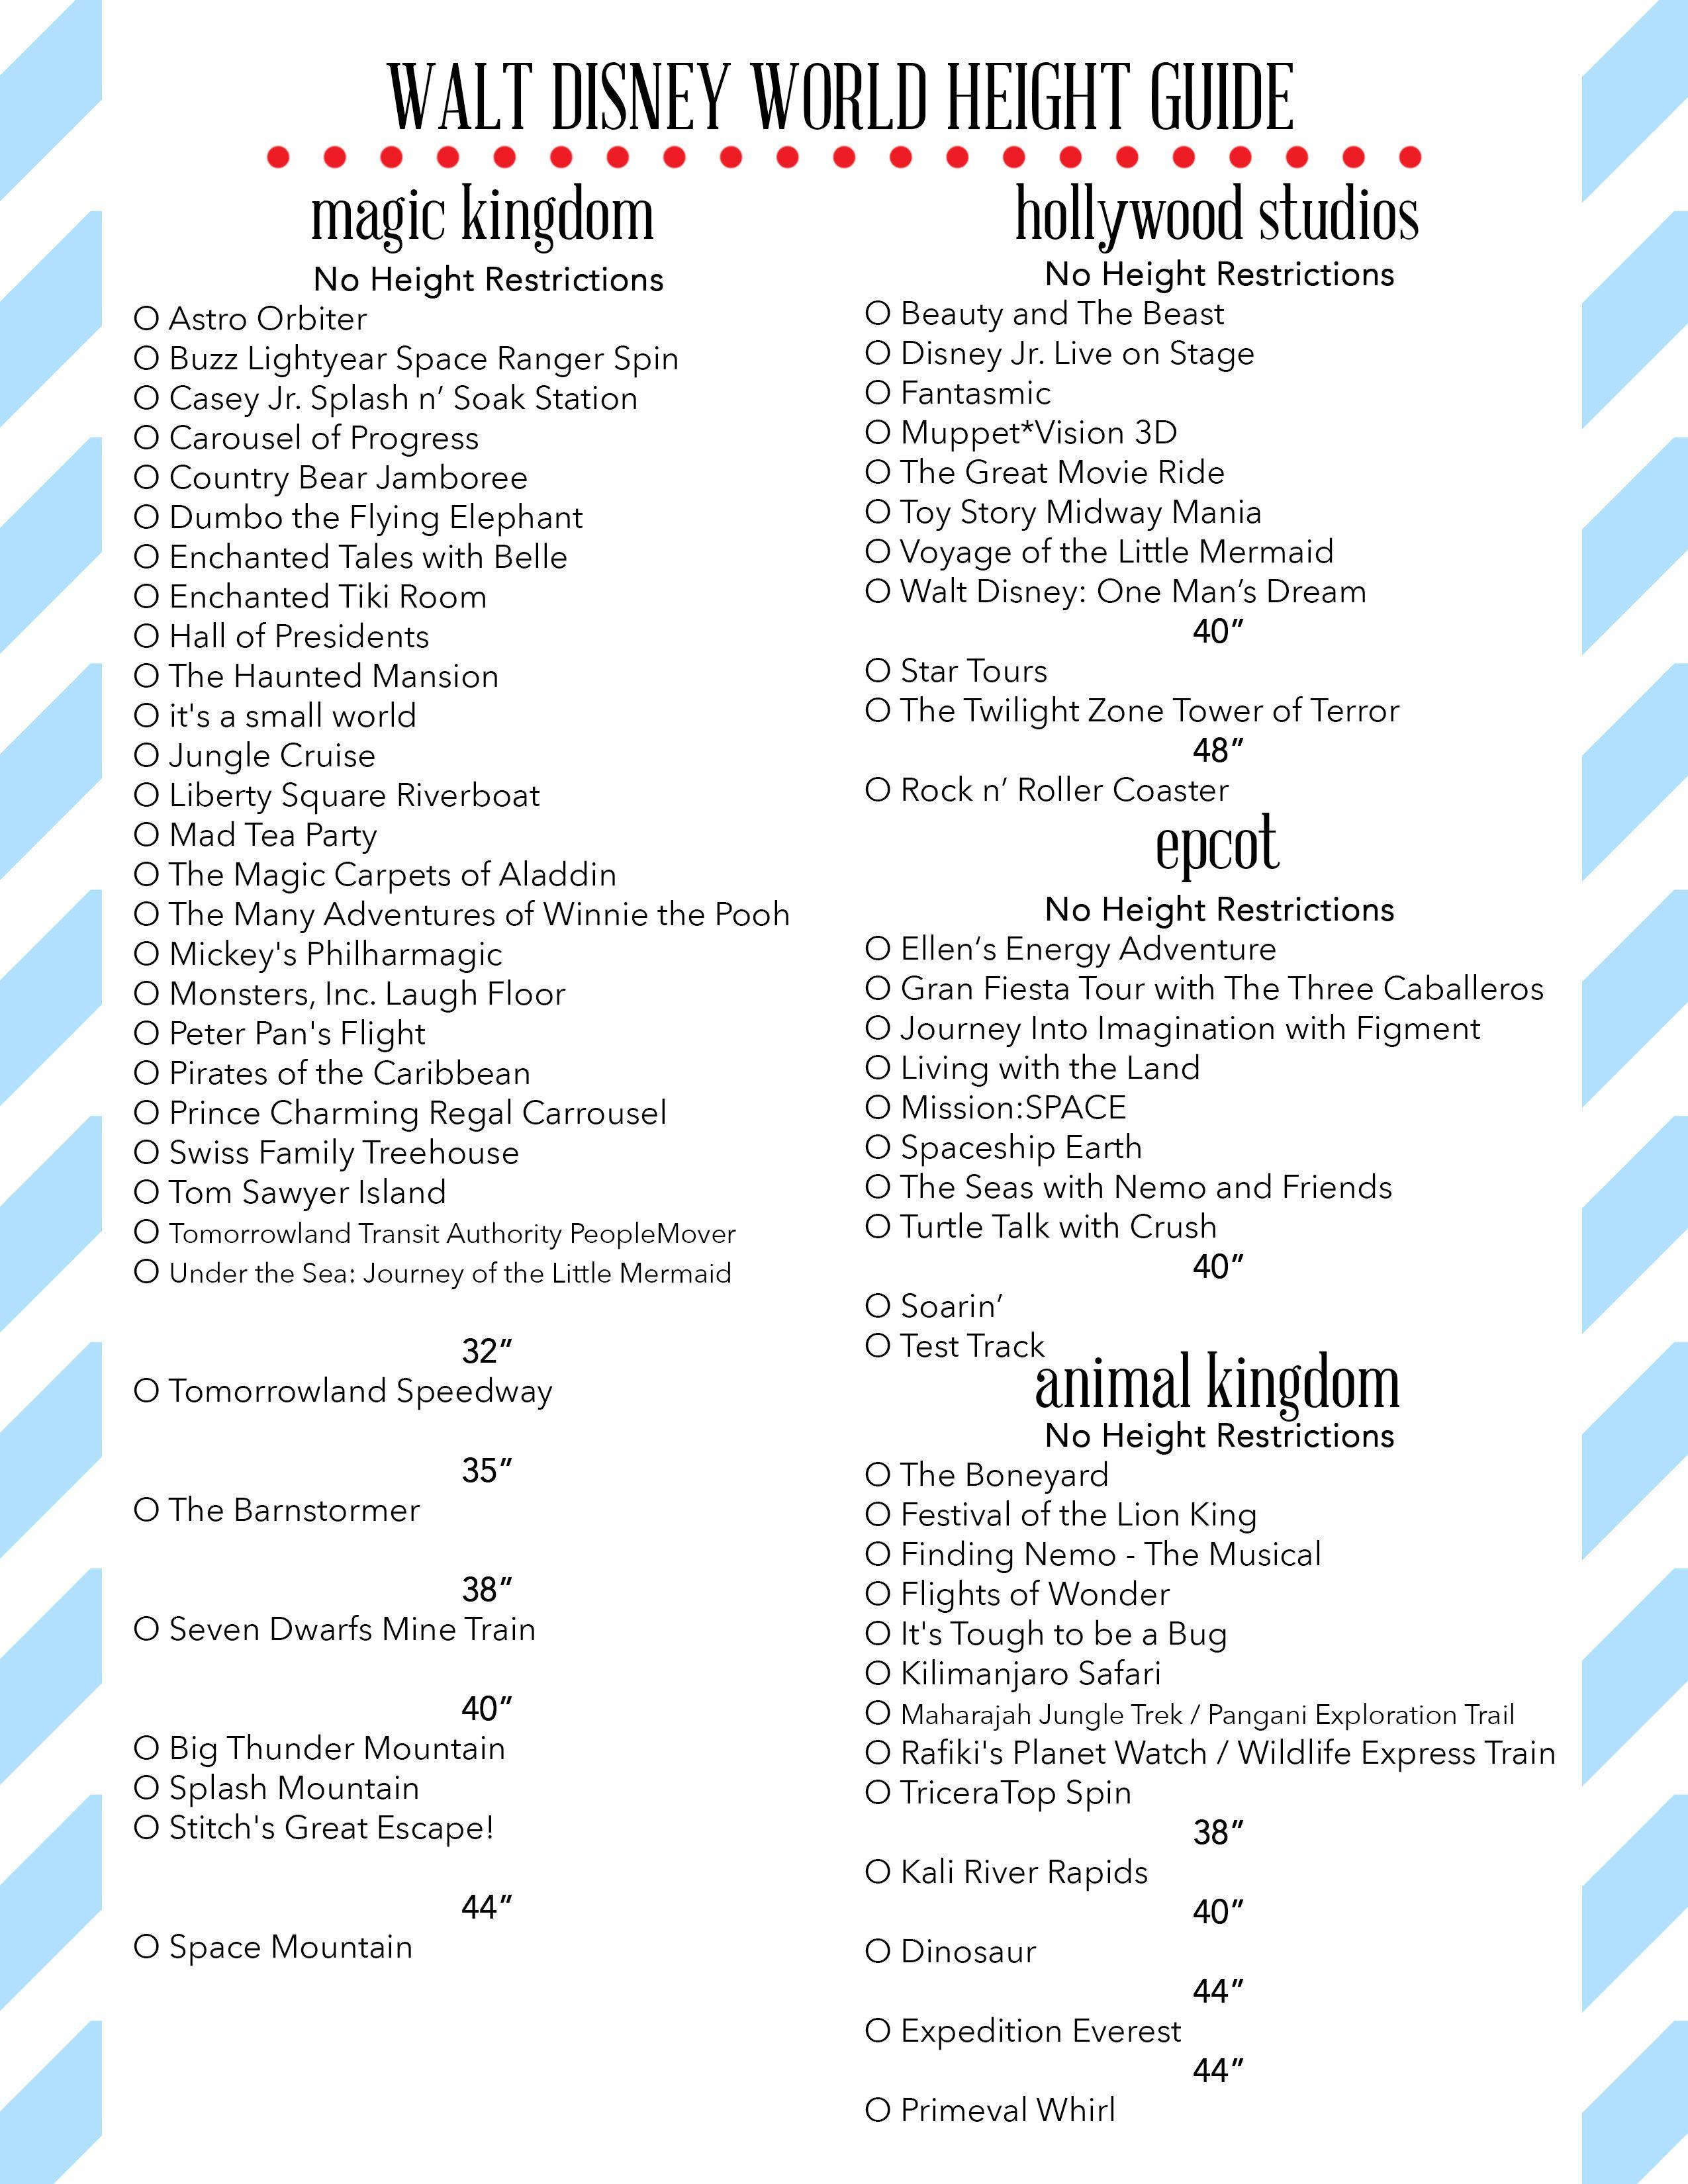 Free Printables | Disney World Rides, Disney World regarding Printable List Of Rides At Disney World 2020 Checklist